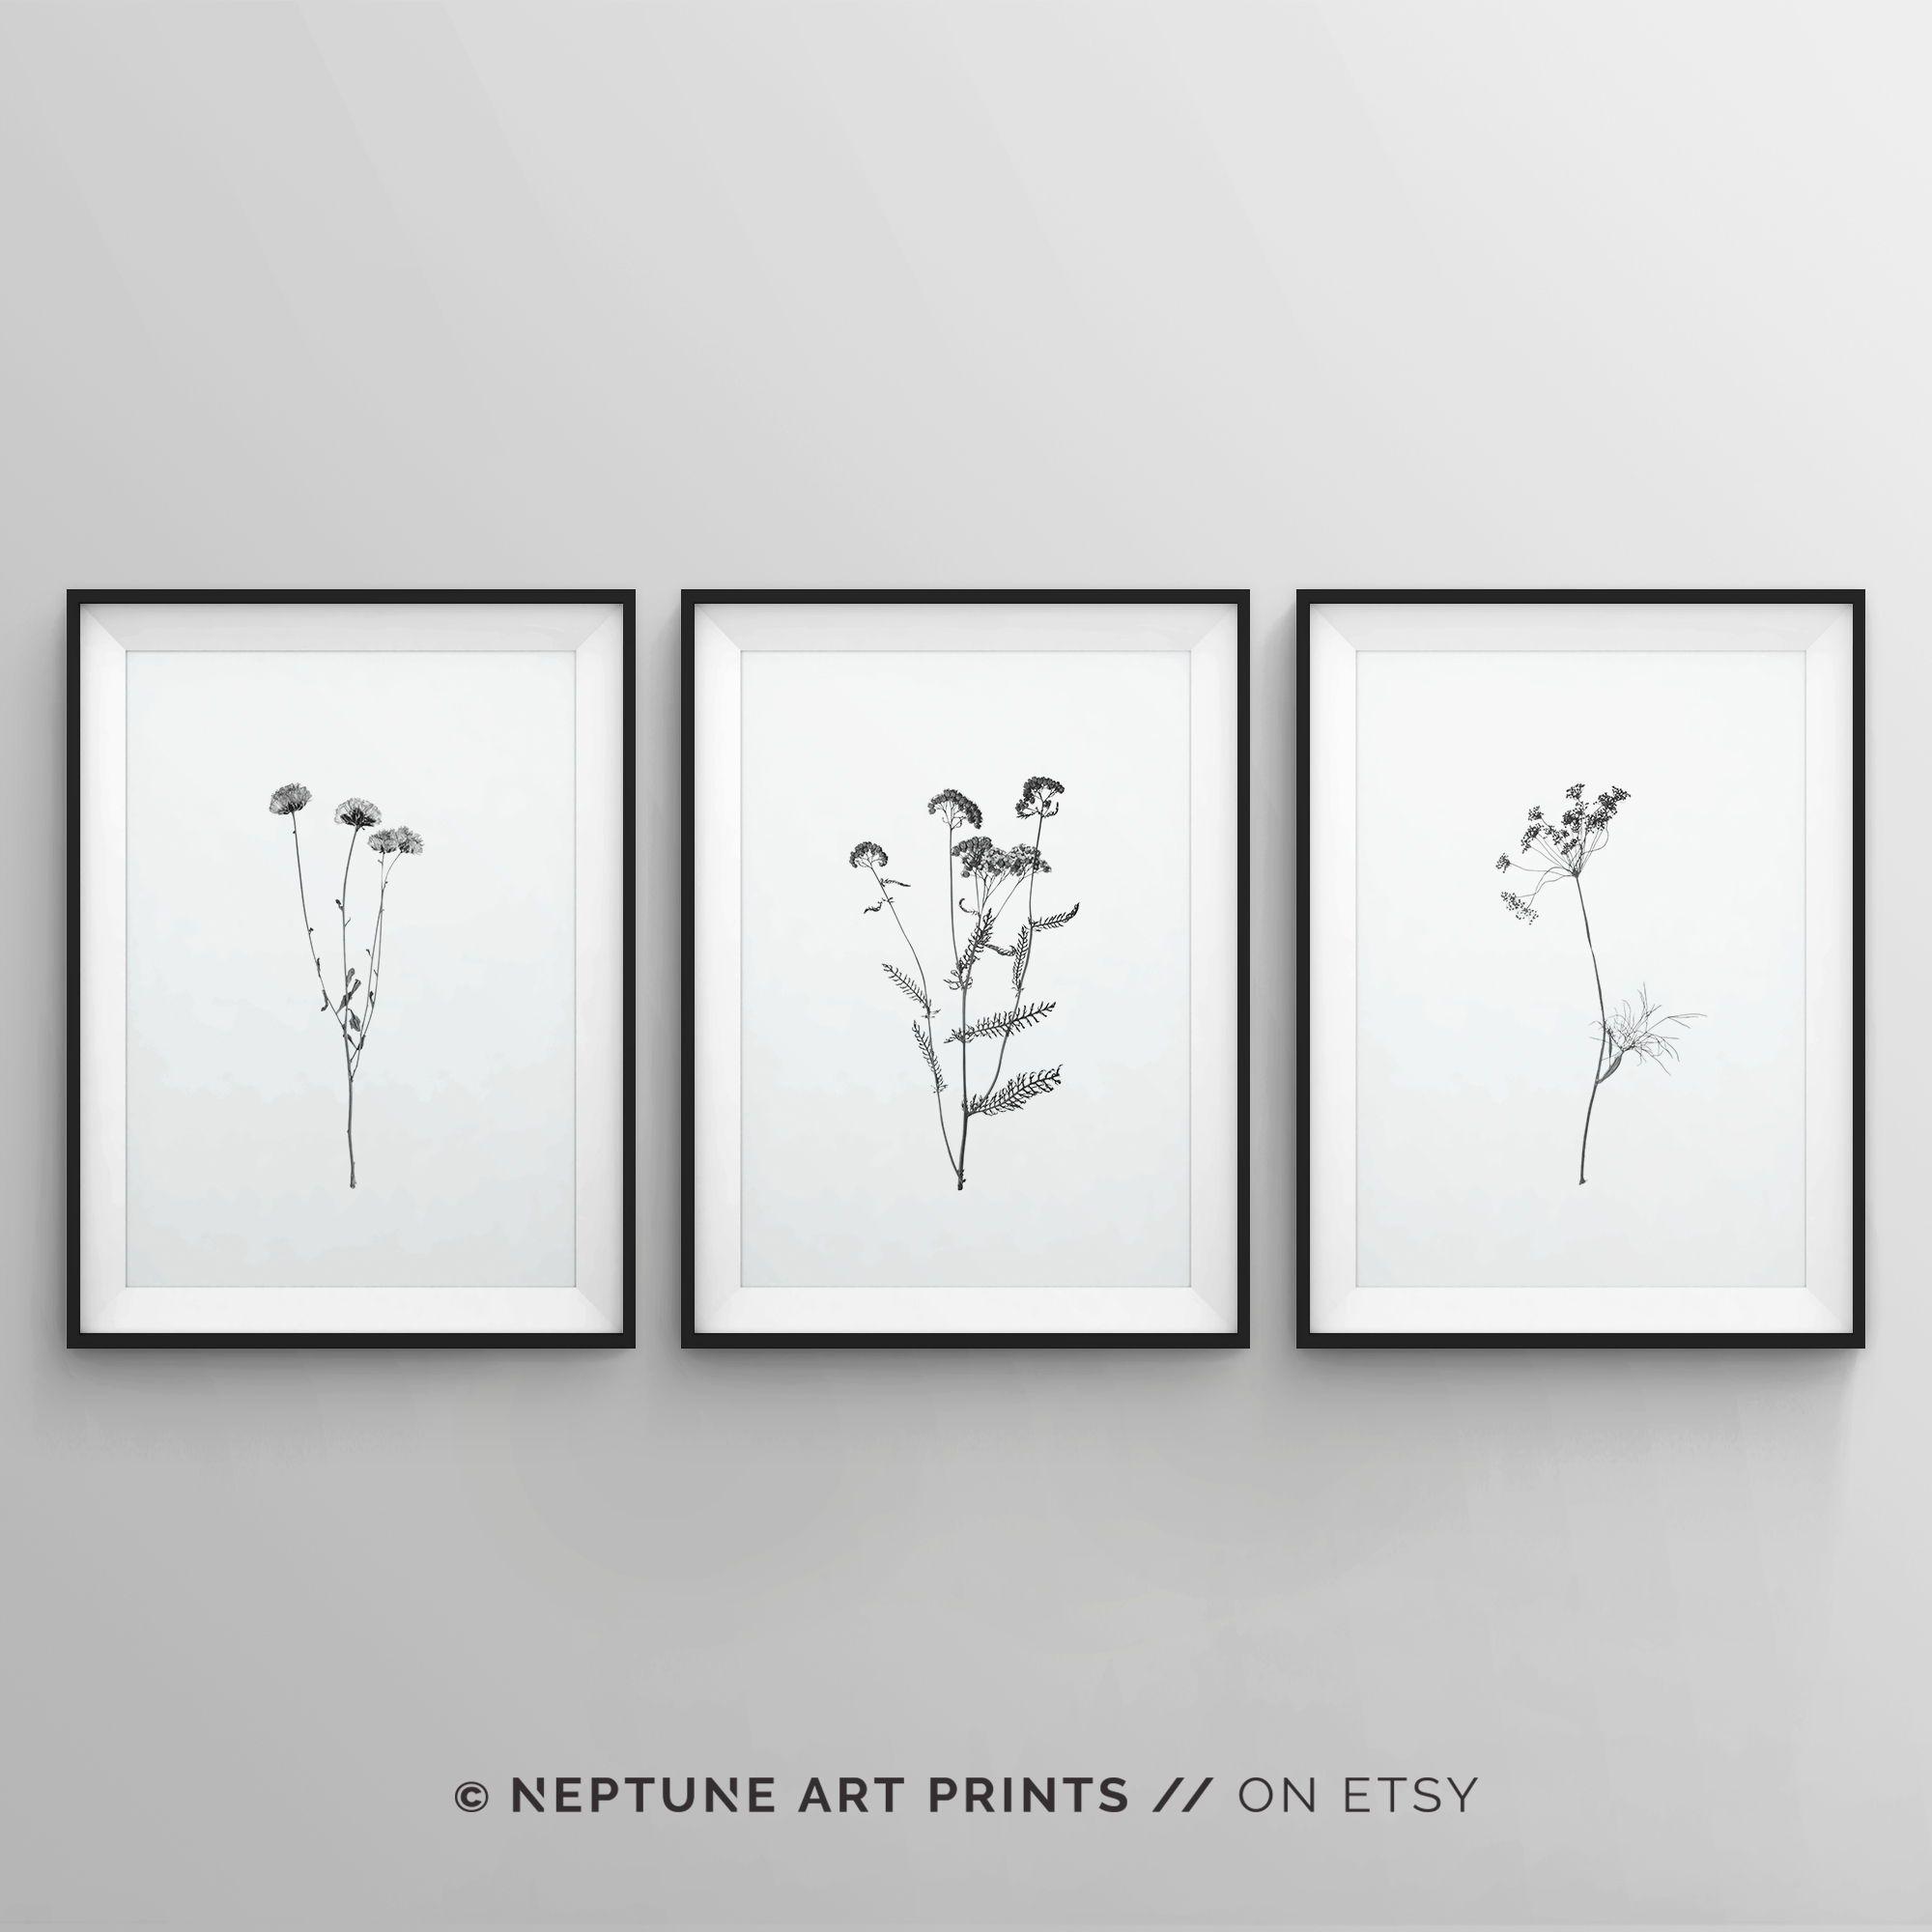 Set Of 3 Black And White Art Prints Minimalist Wall Art Prints Modern Floral Flowers Poster Set 3 Piece Wall Decor Plants Zen Peace In 2020 Minimalist Wall Art Wall Art